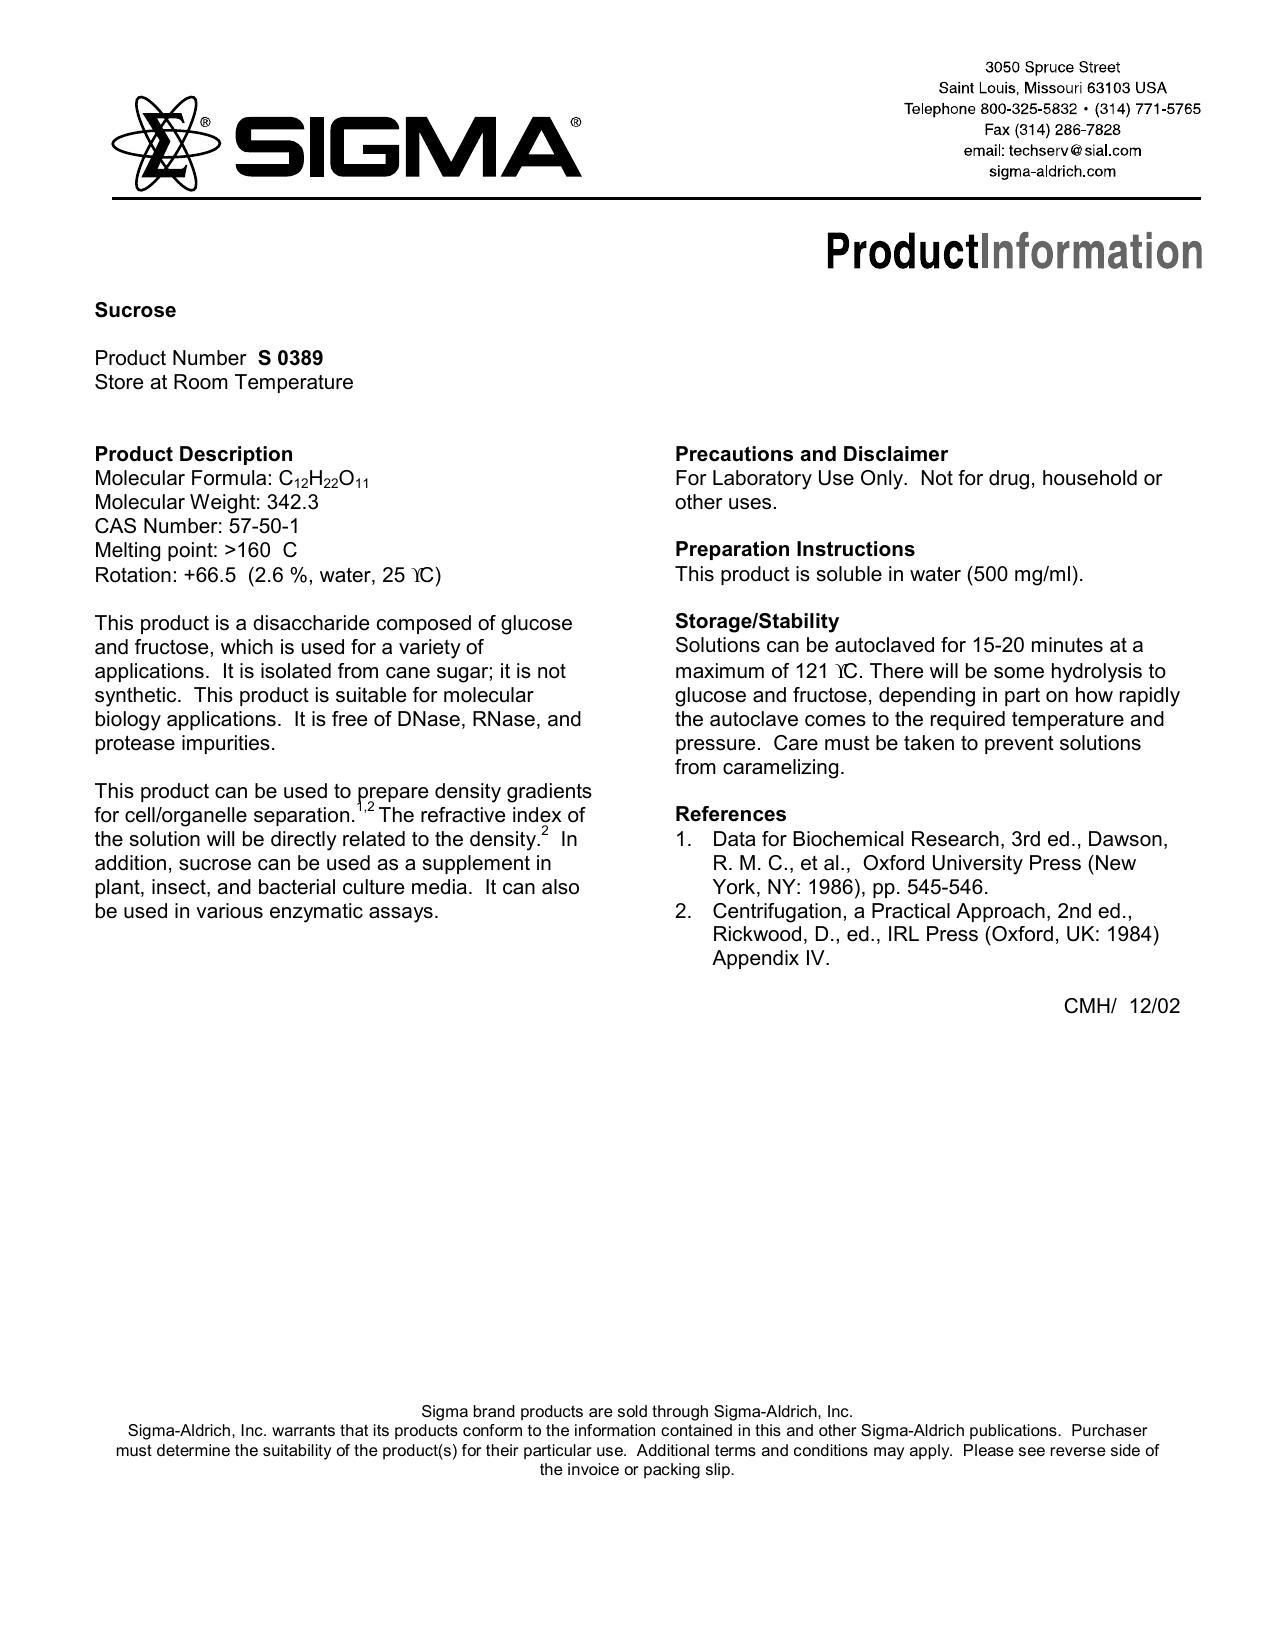 aldrich chemical catalog